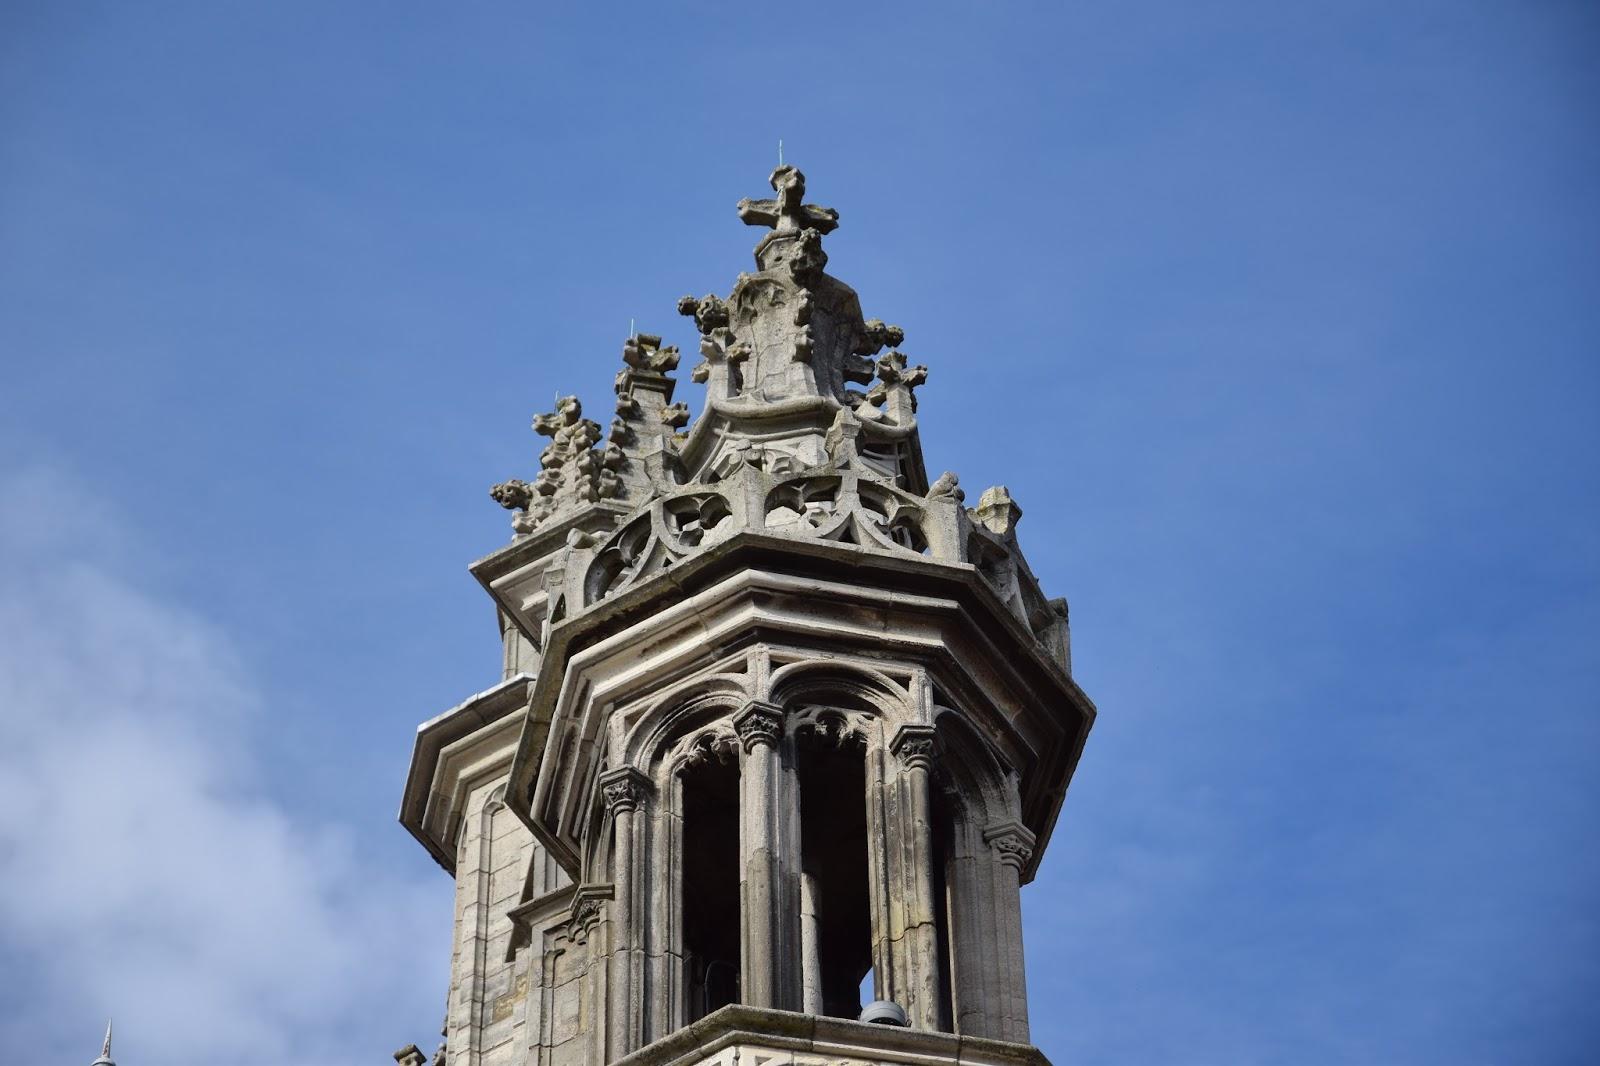 Middelburg wieża ratusza